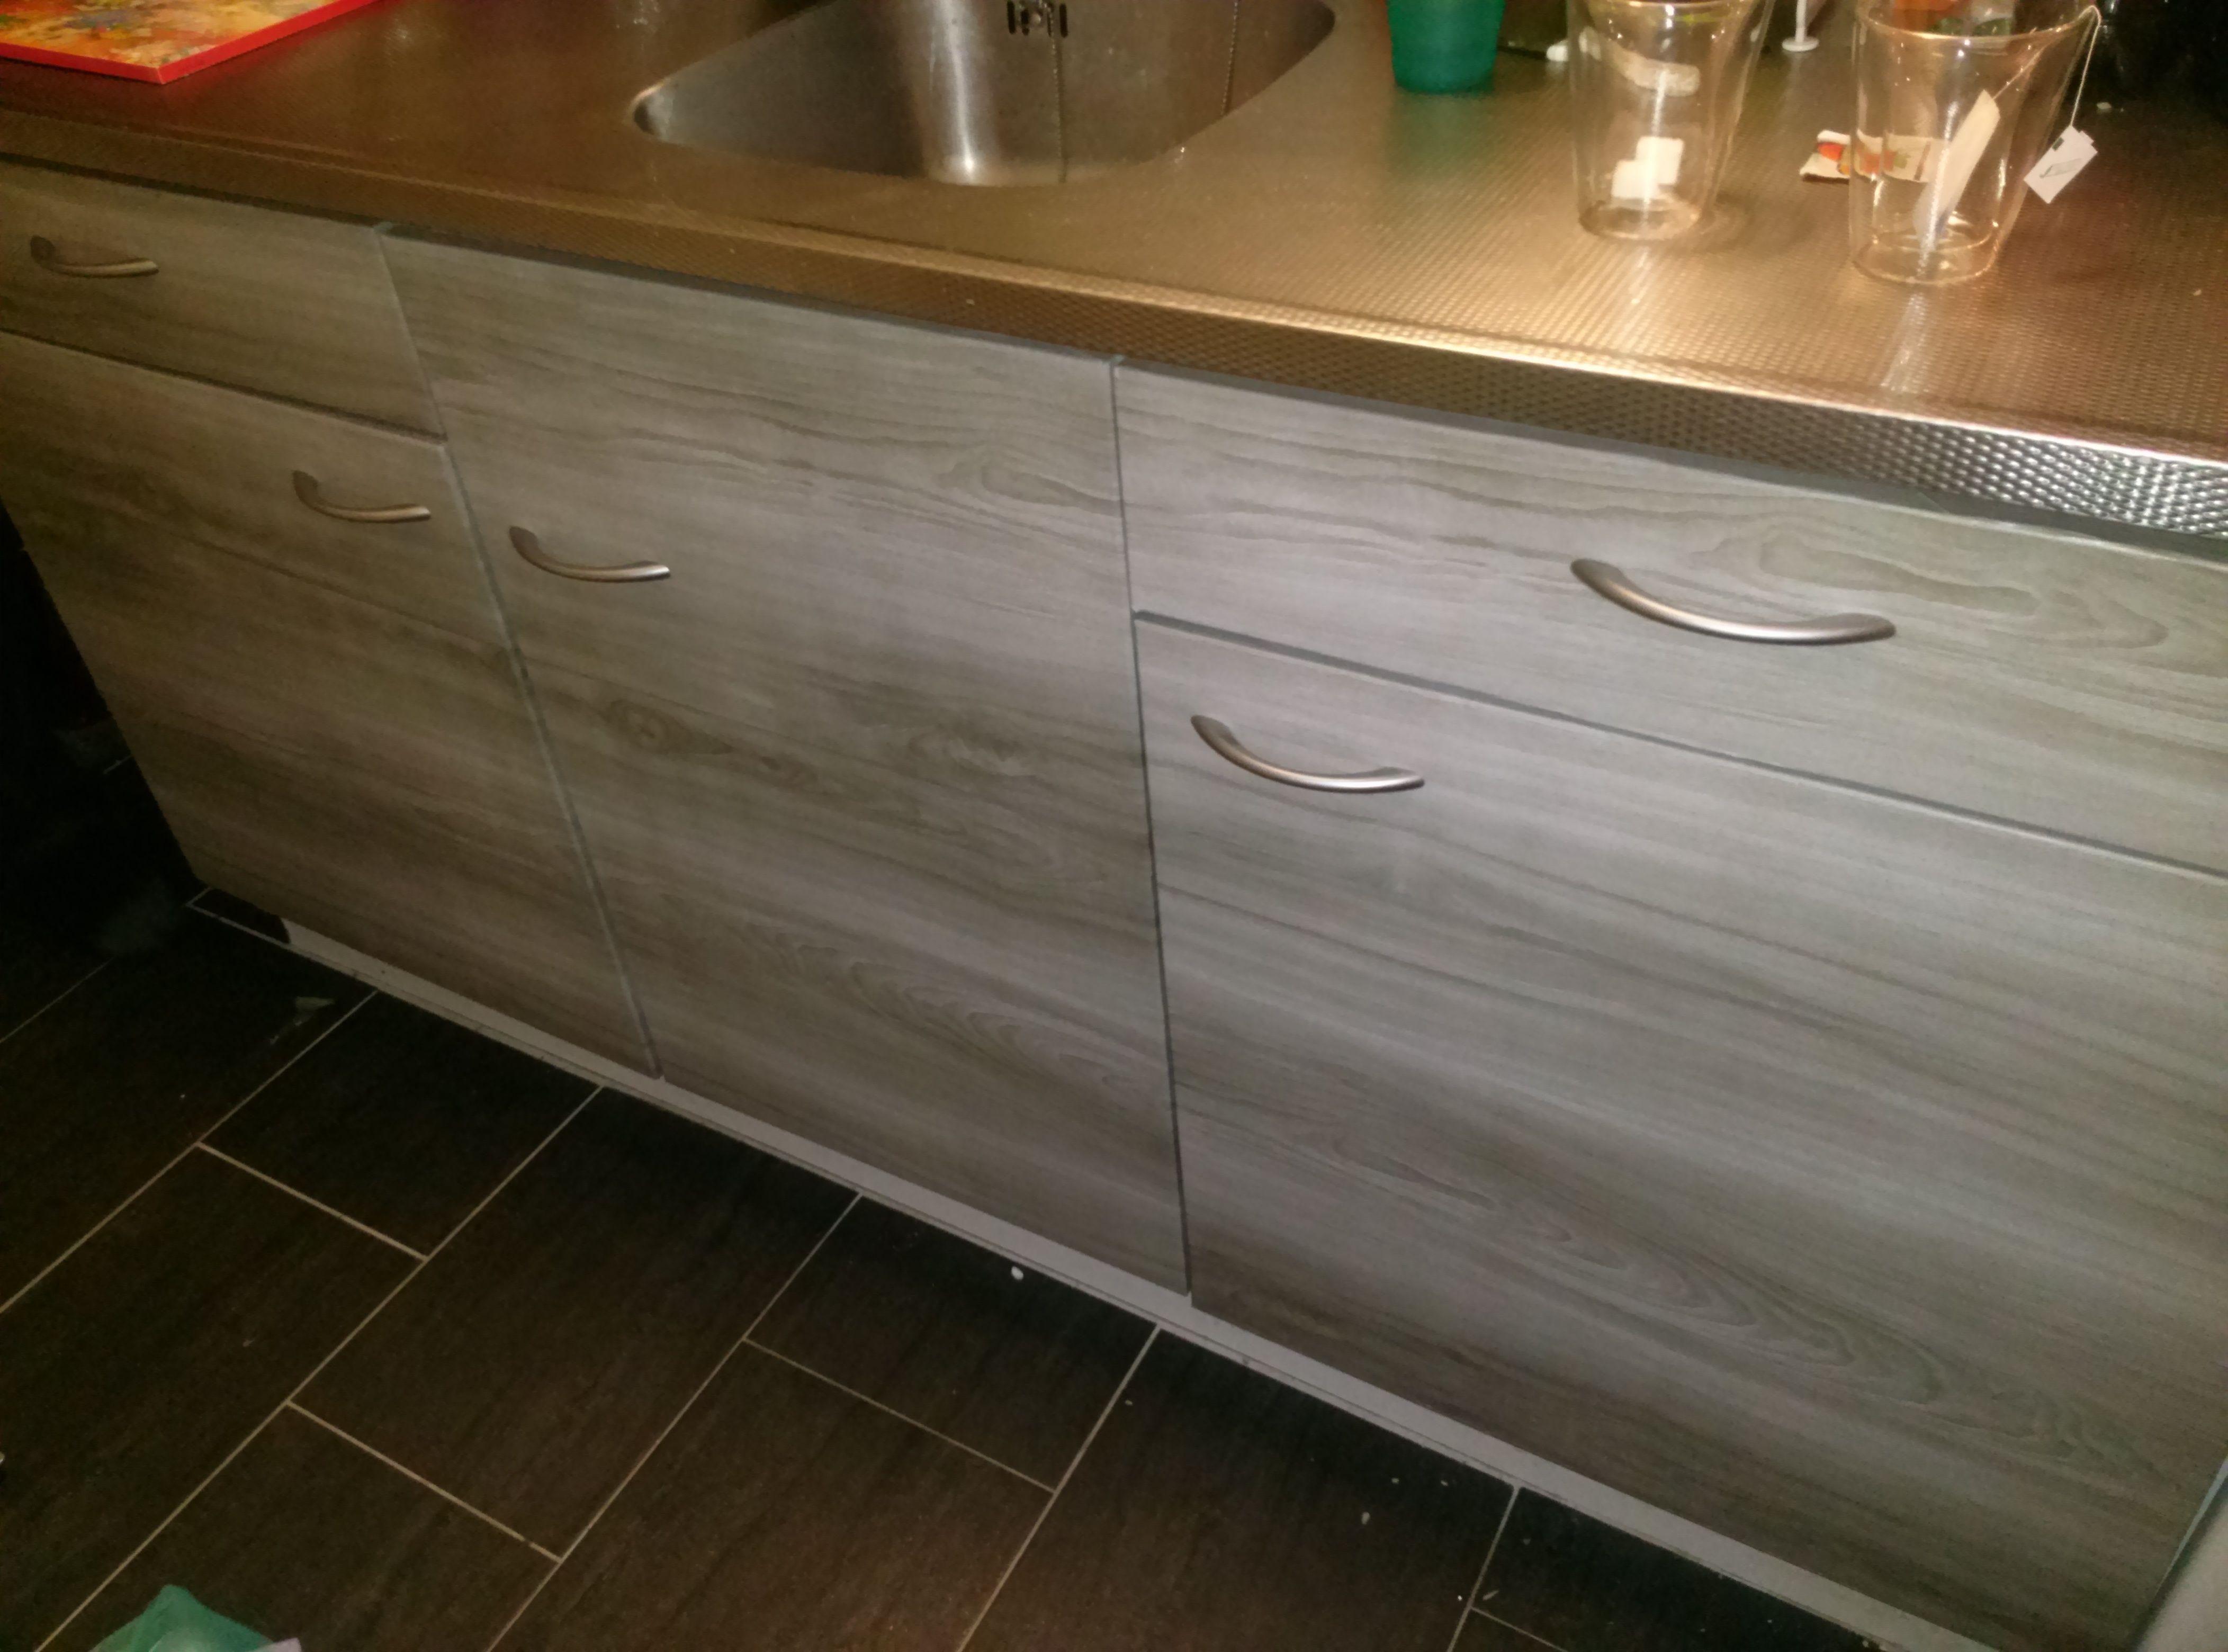 keukenkastjes om getoverd in een middag, plakfolie    me   Pinterest   Om